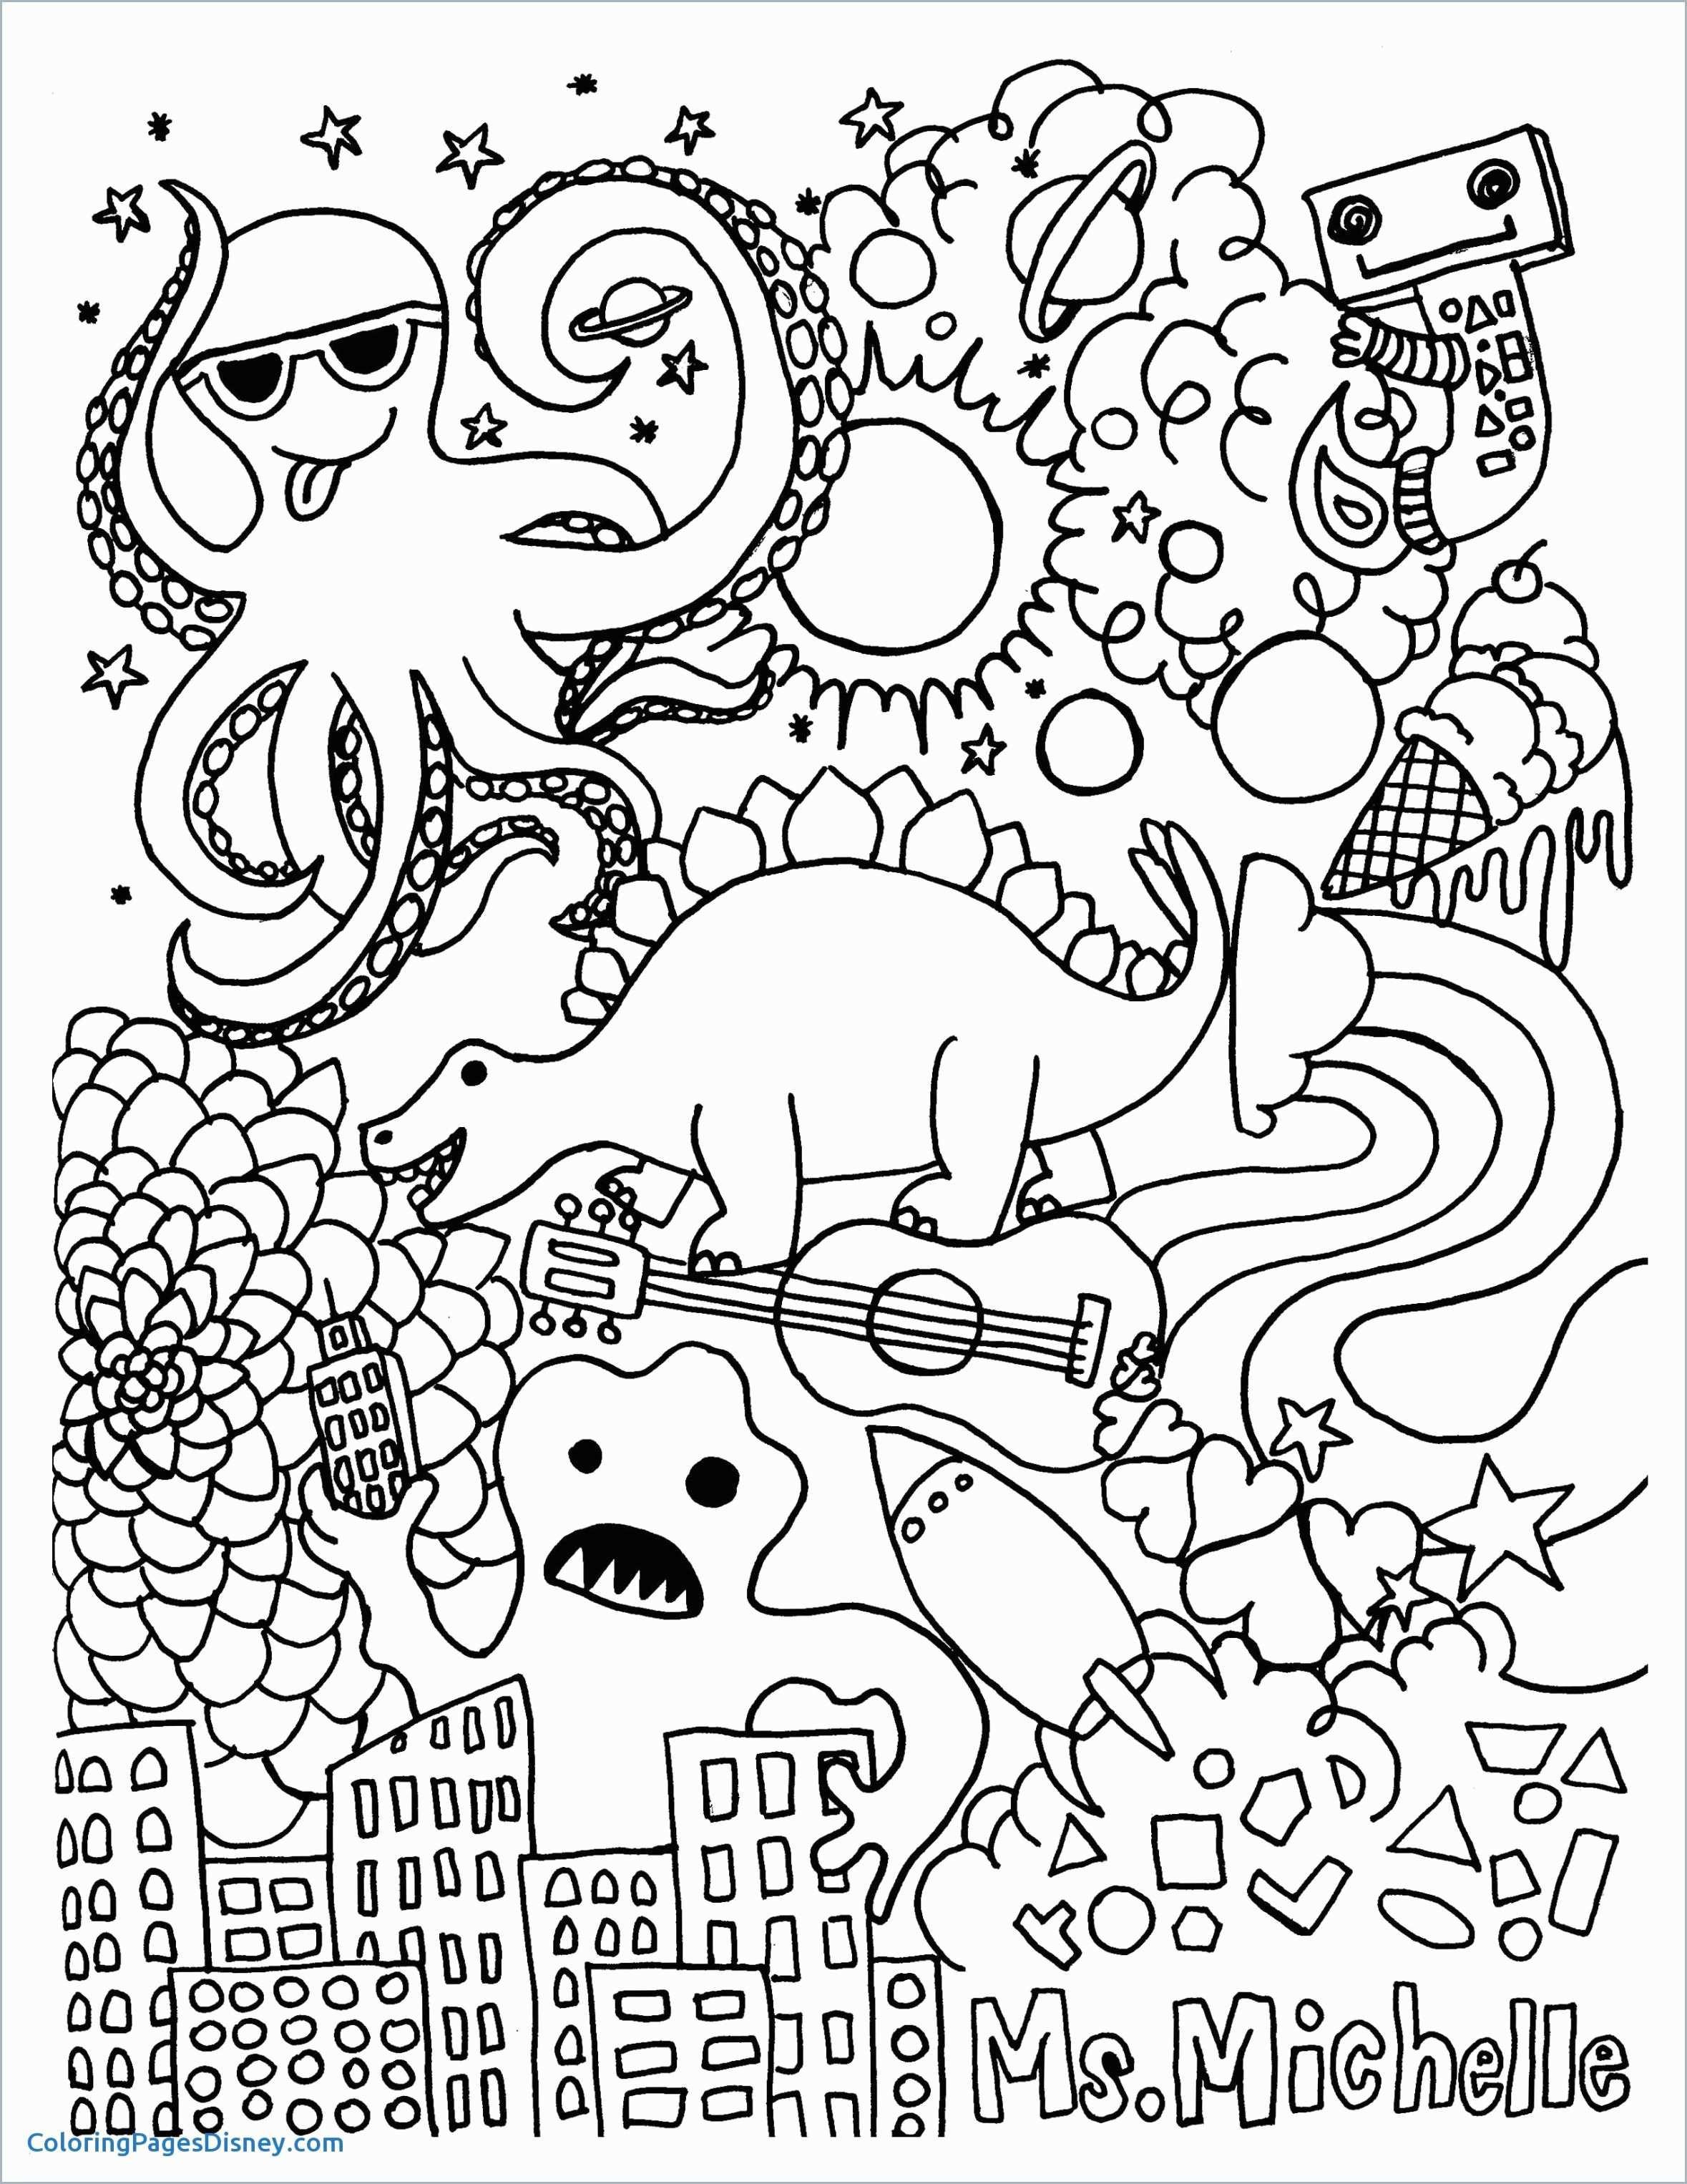 Mia and Me Ausmalbilder Zum Ausdrucken Das Beste Von Mia and Me Coloring Pages Amazing 40 Mia Me Ausmalbilder Stock